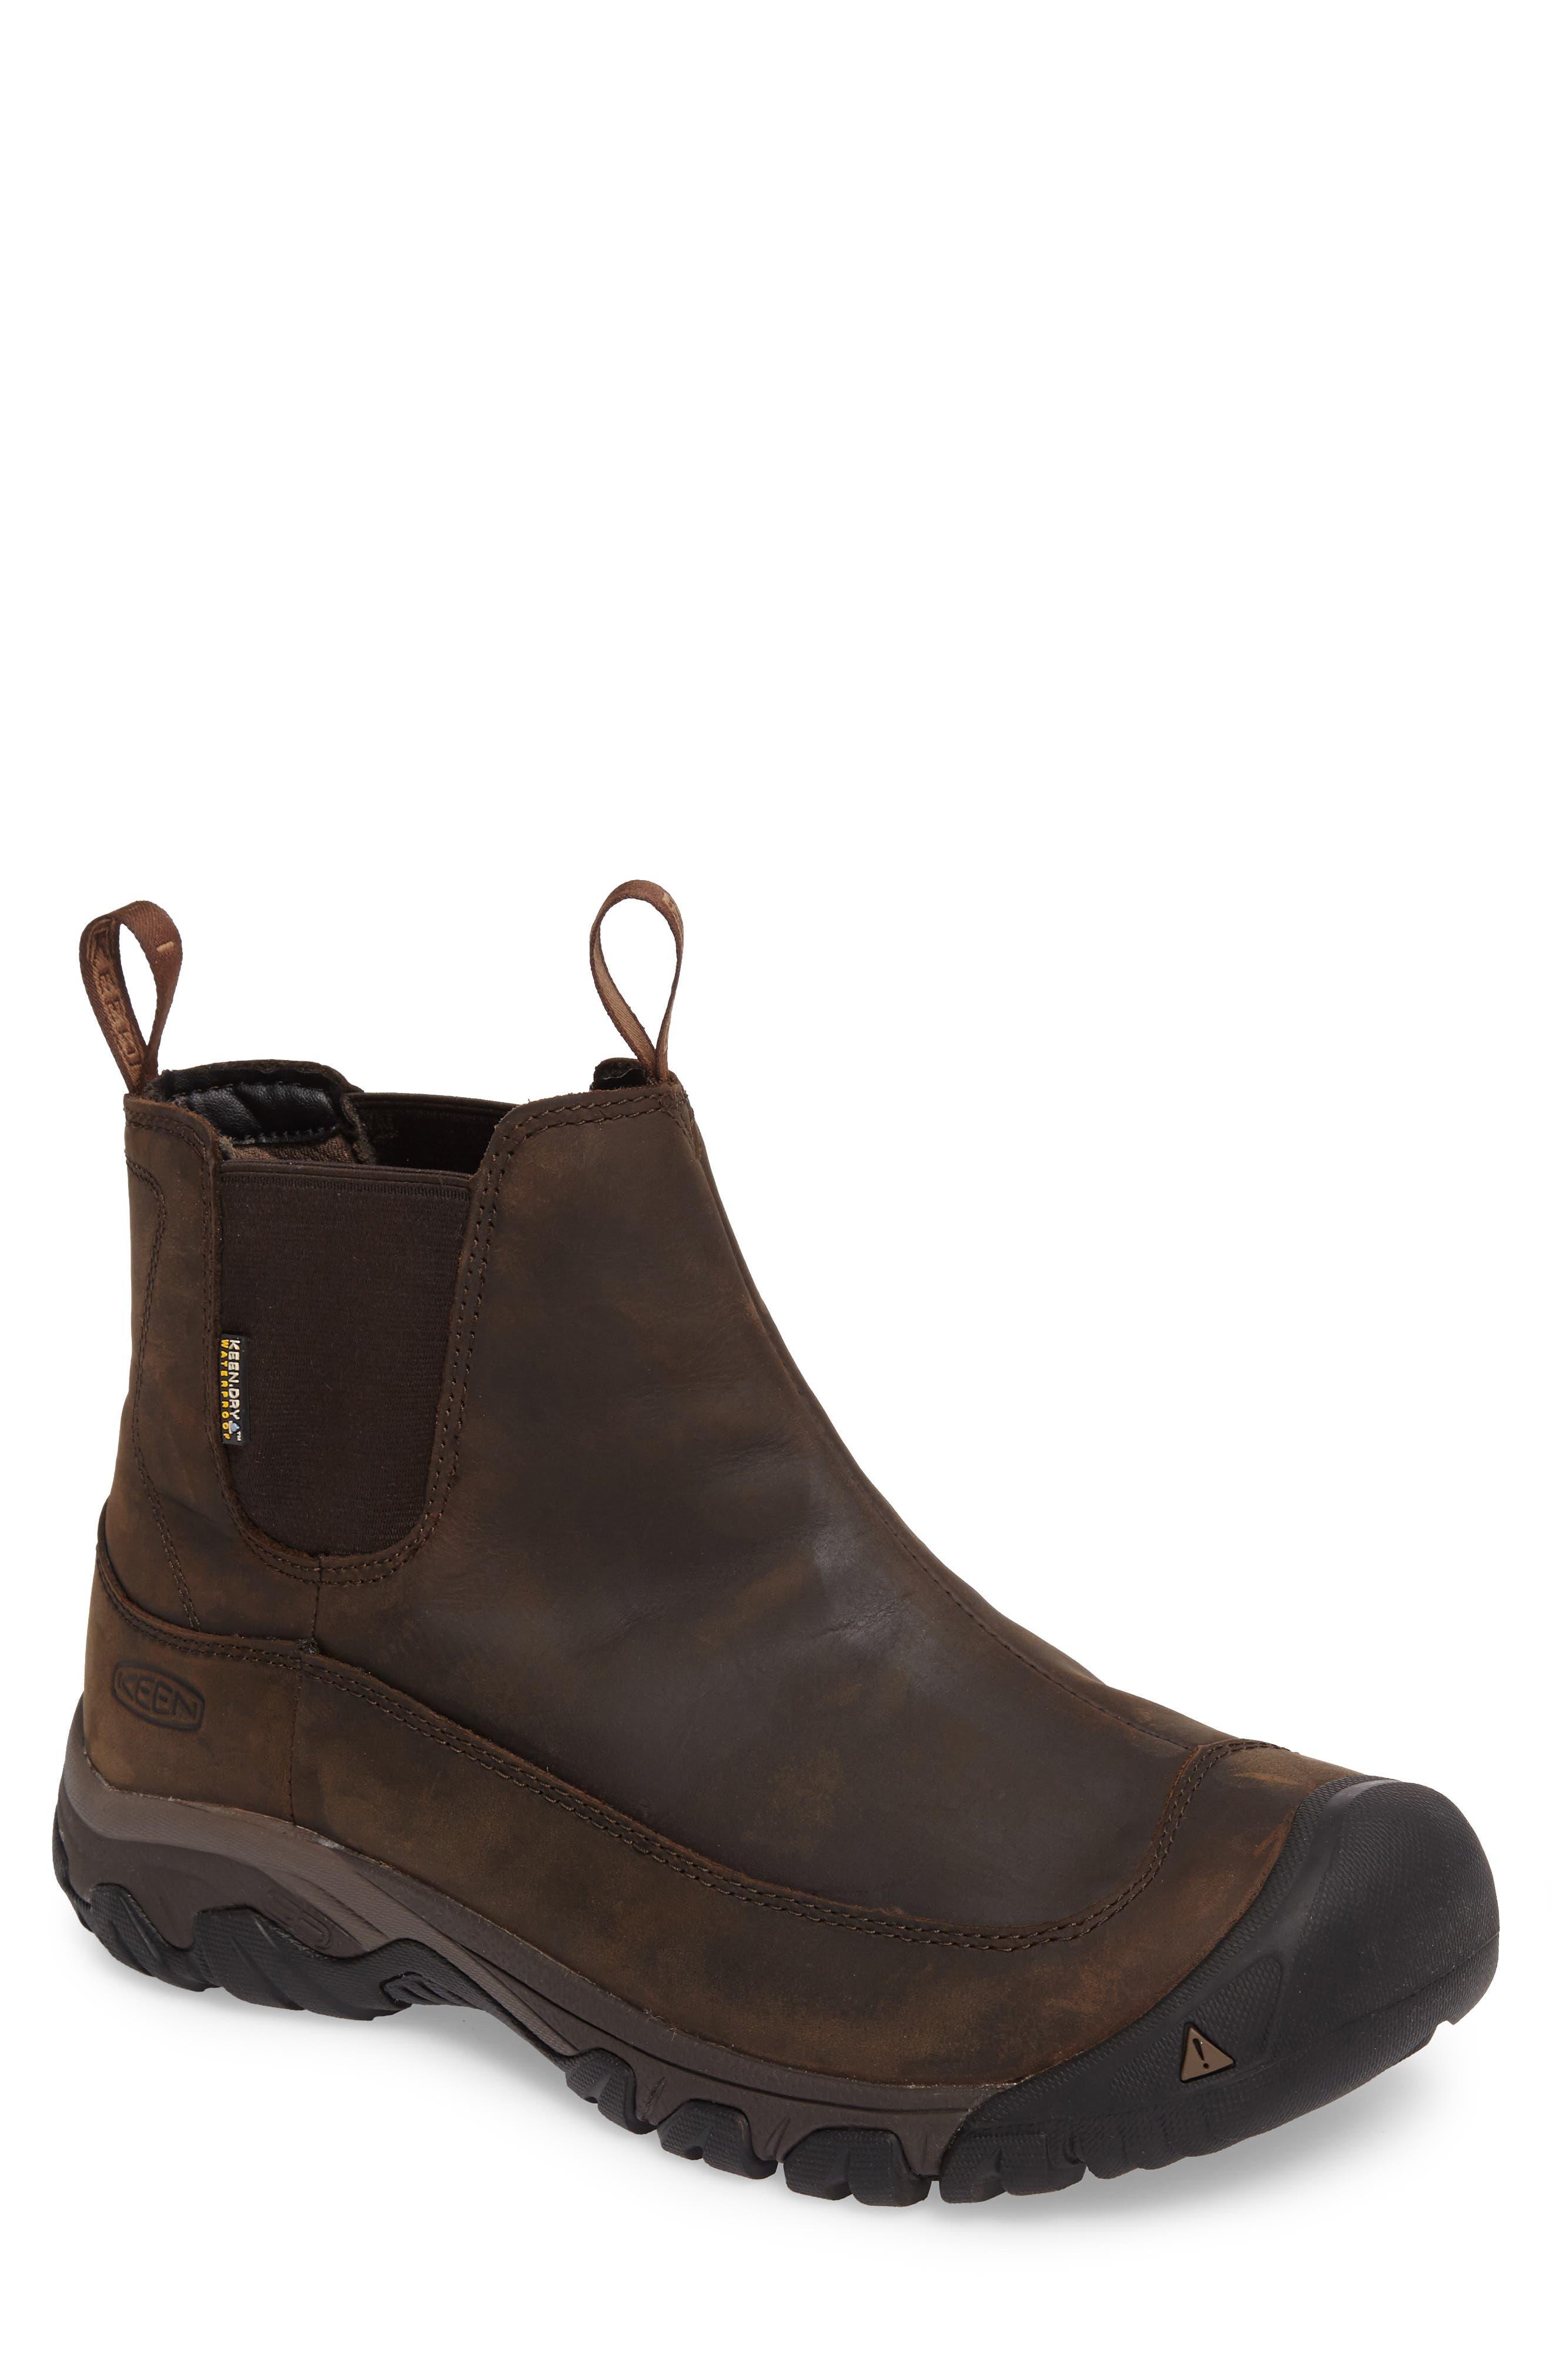 Anchorage Ii Waterproof Chelsea Boot